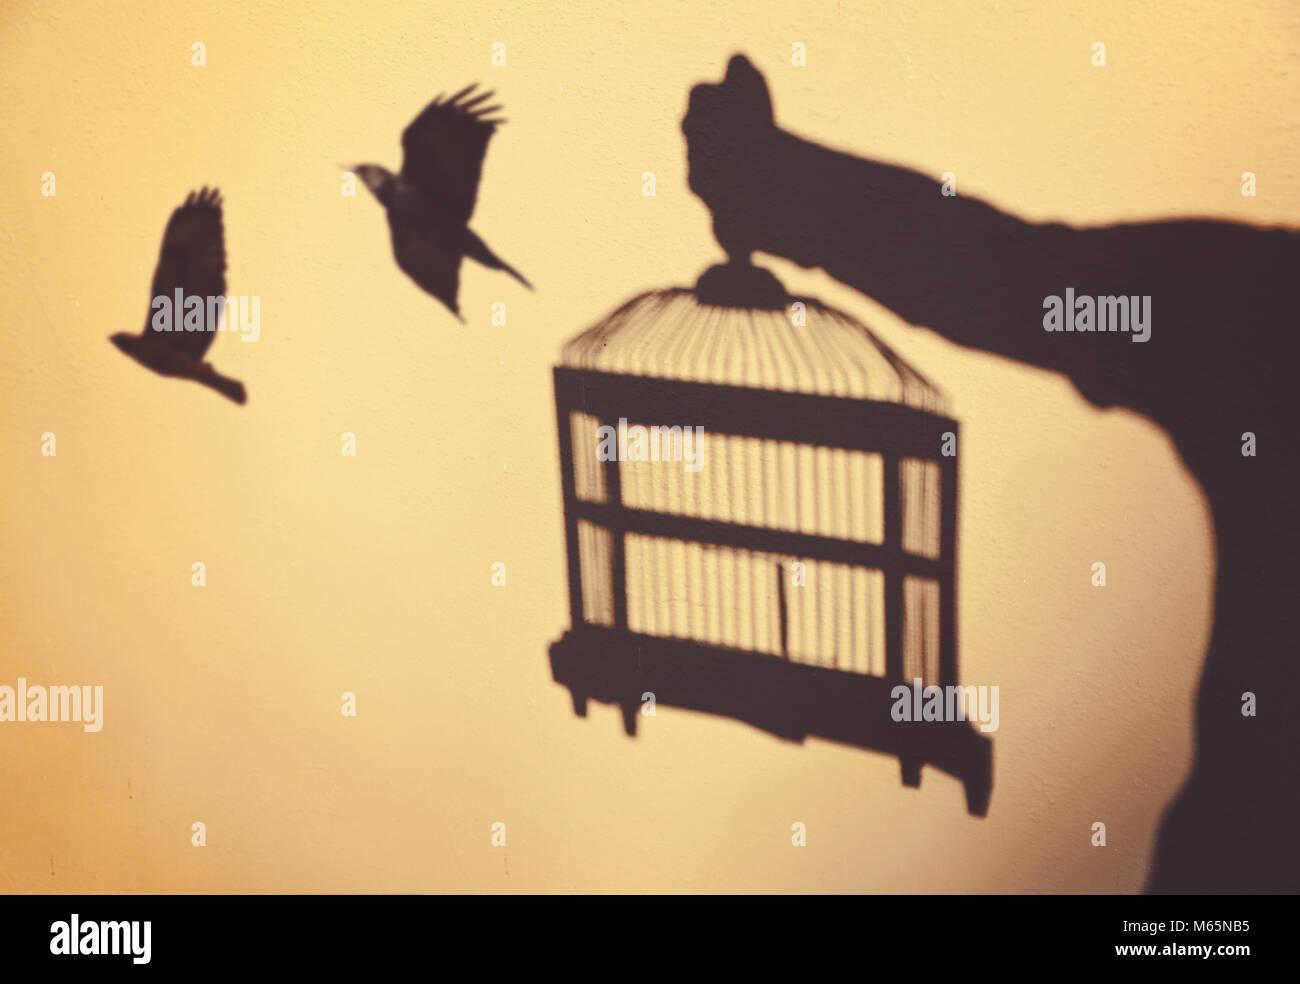 Magnificent Birds In Flight Wall Decor Adornment - The Wall Art ...